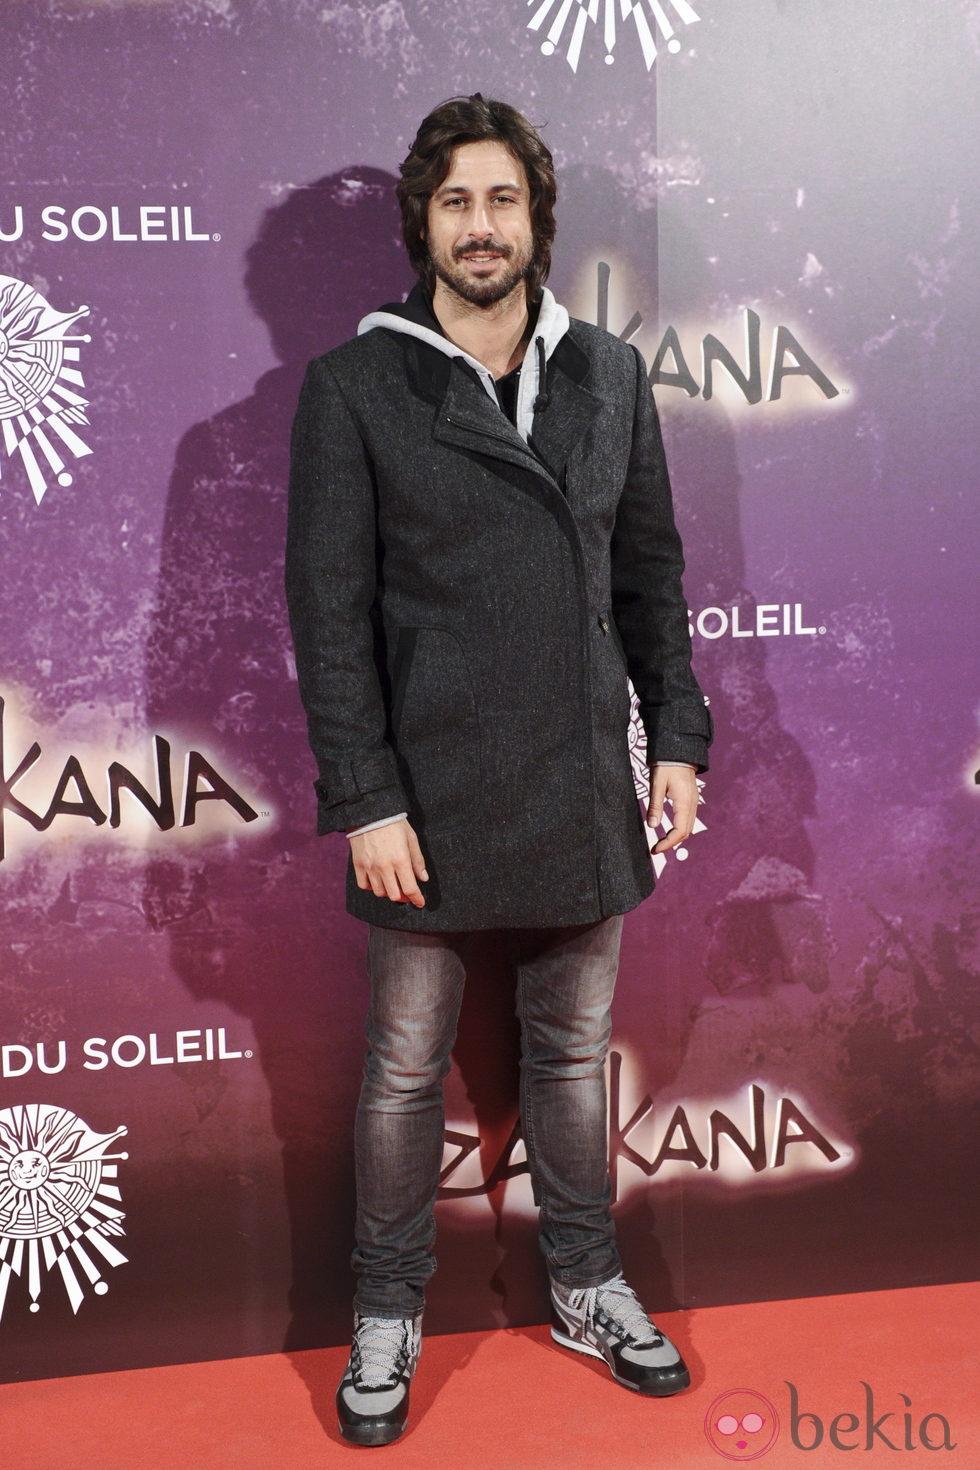 Hugo Silva en el estreno de Zarkana